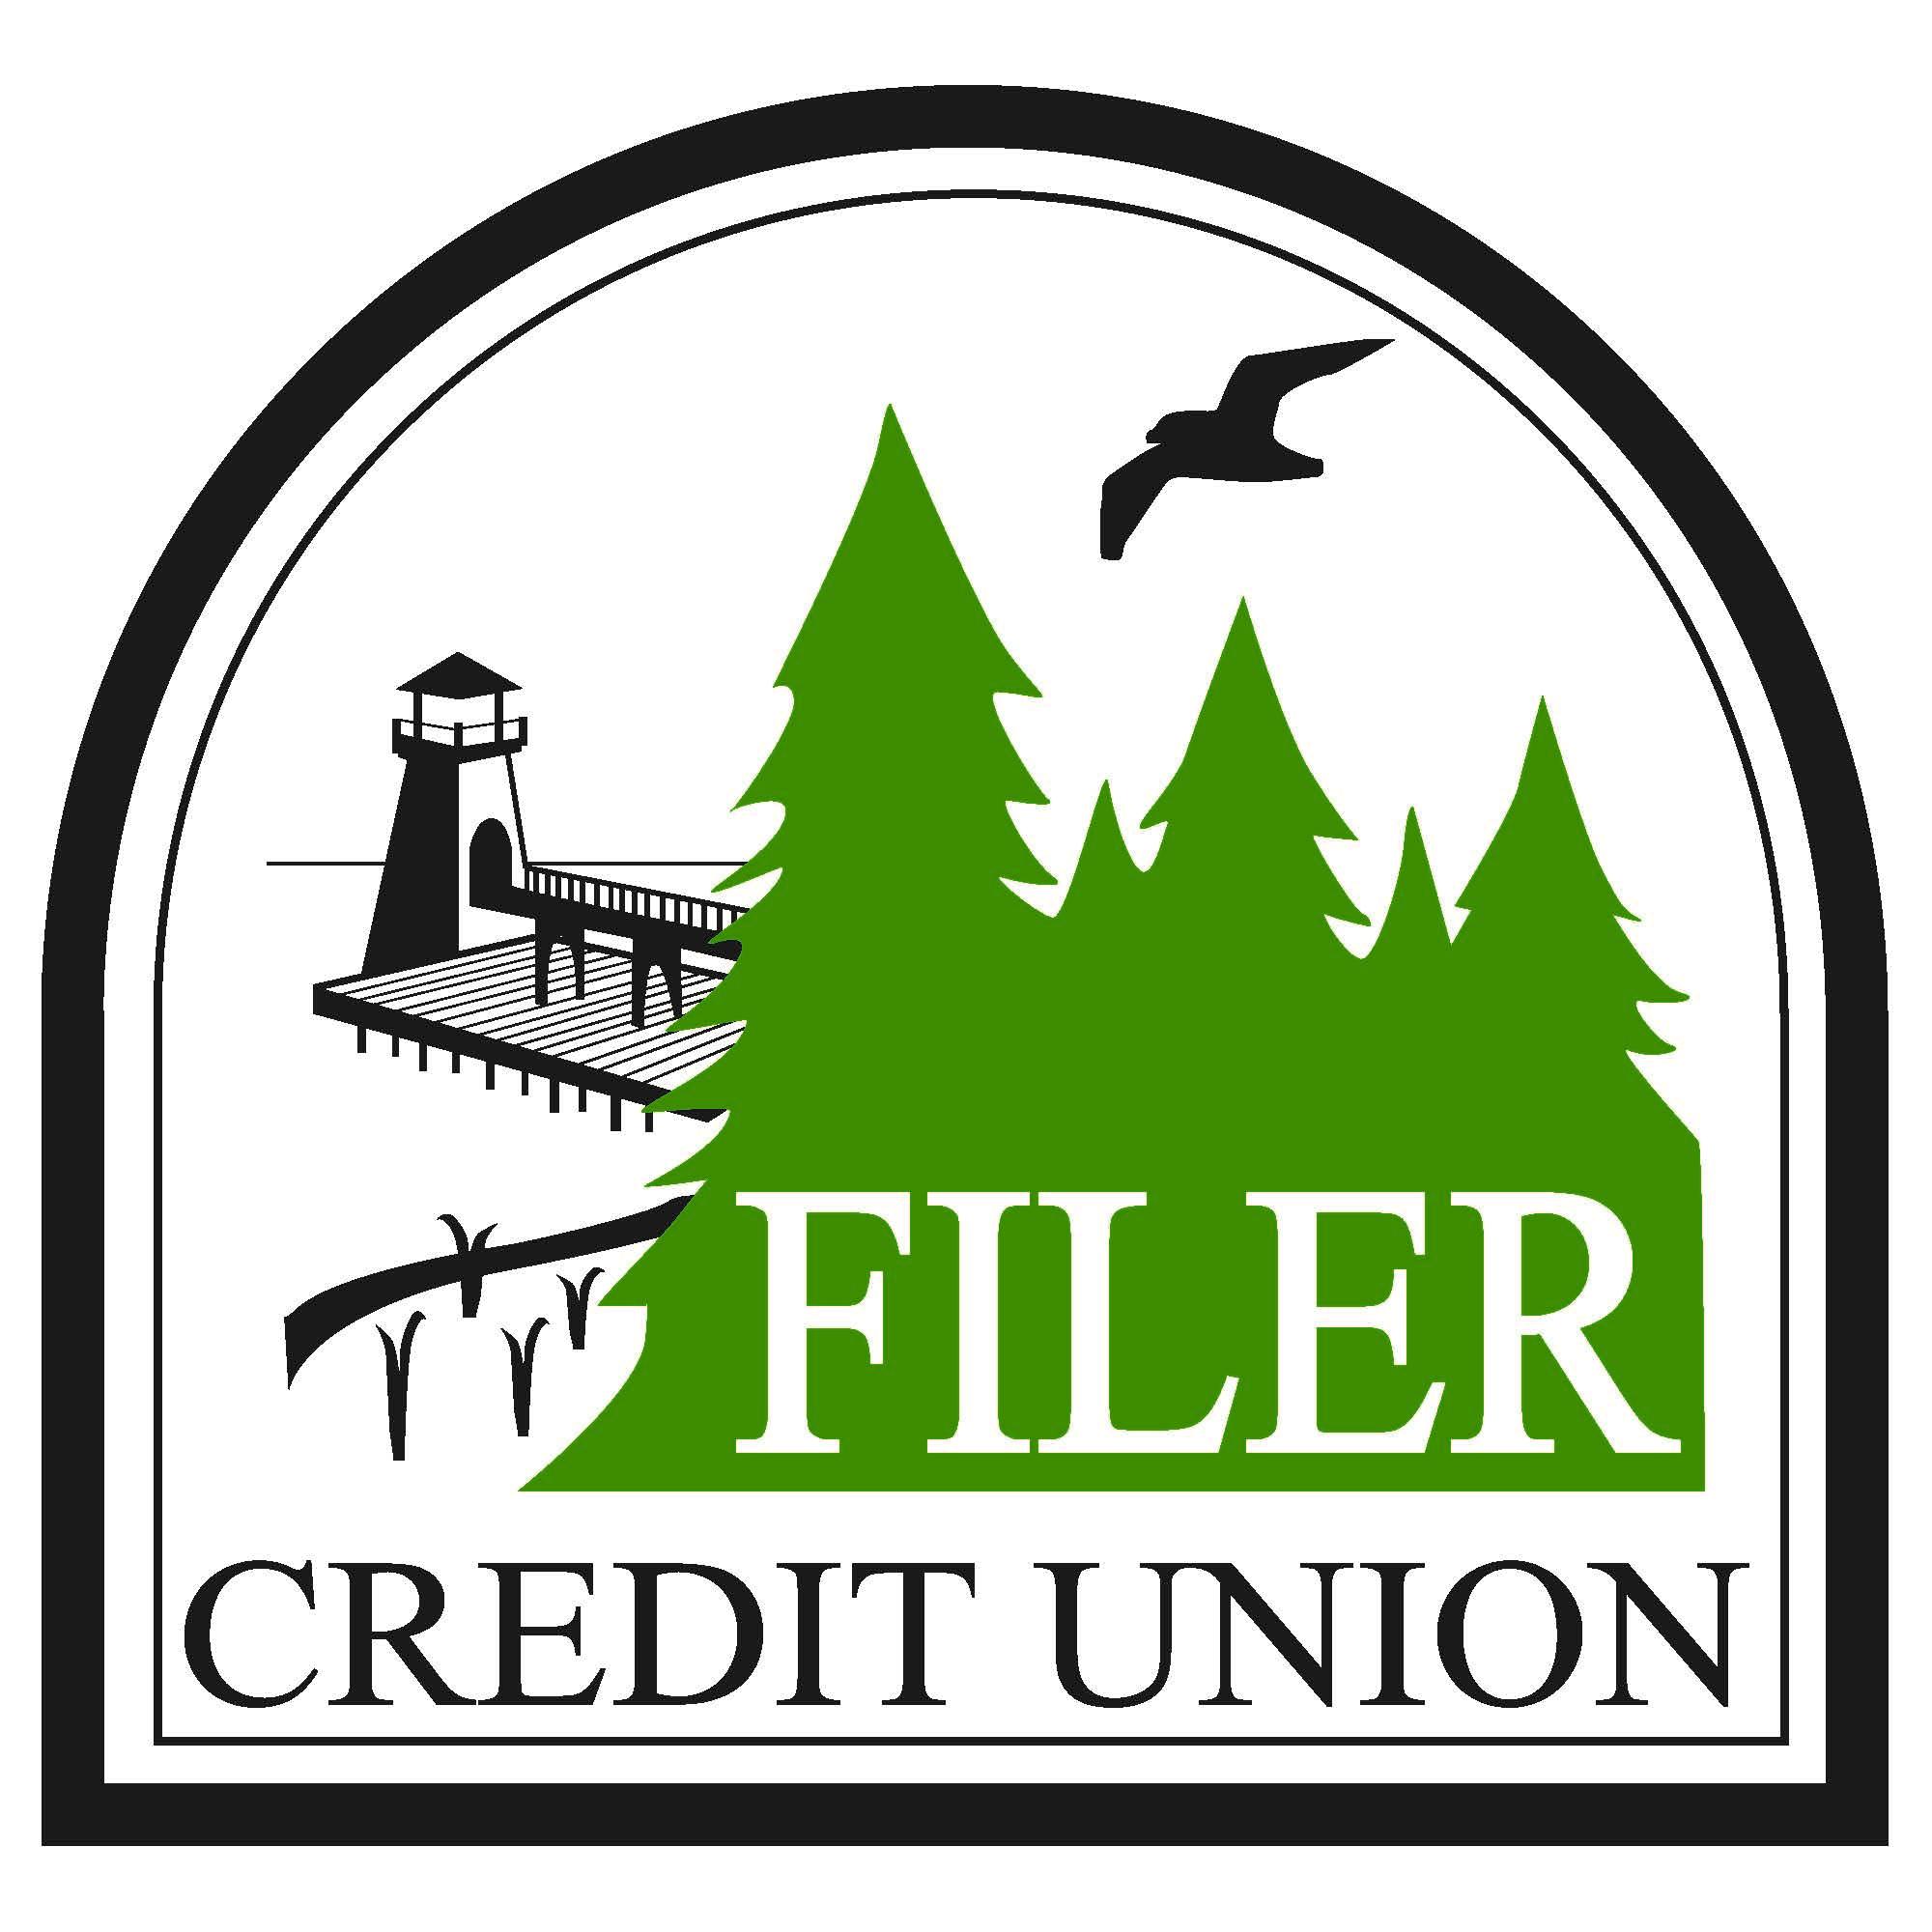 https://growthzonesitesprod.azureedge.net/wp-content/uploads/sites/1264/2020/10/Filer-Credit-Union-logo-1.jpg